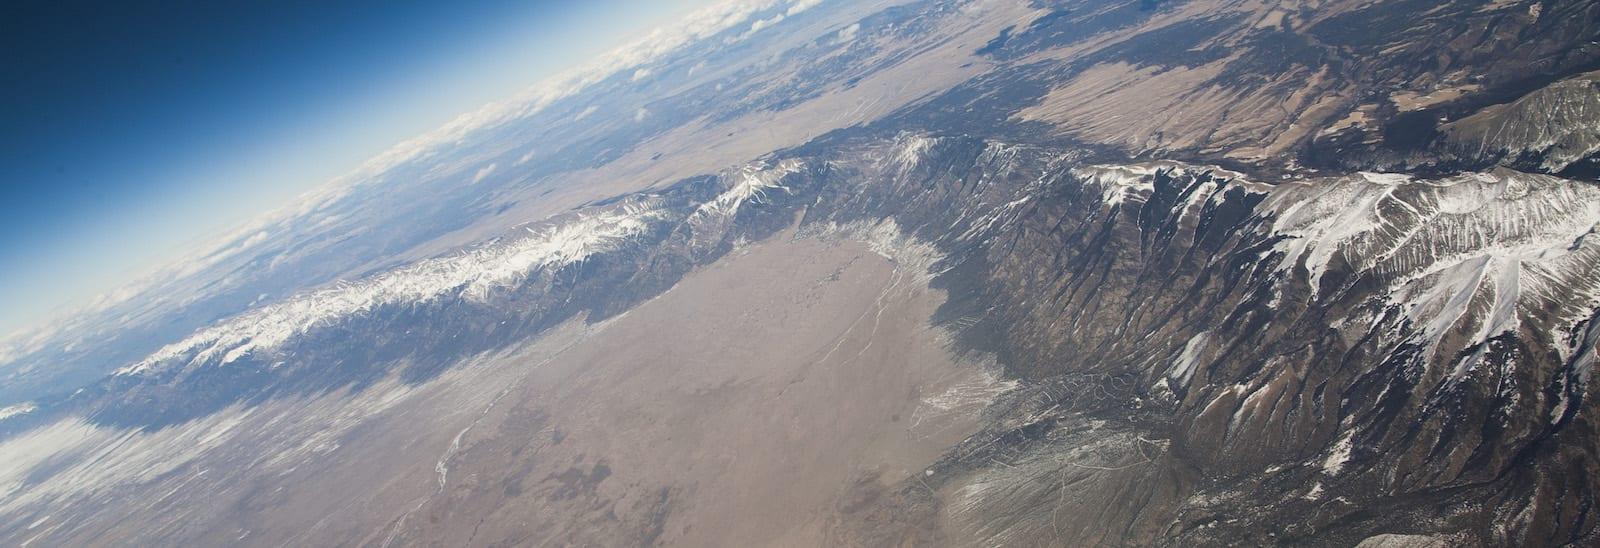 Sangre de Cristo Mountains Sand Dunes Aerial View